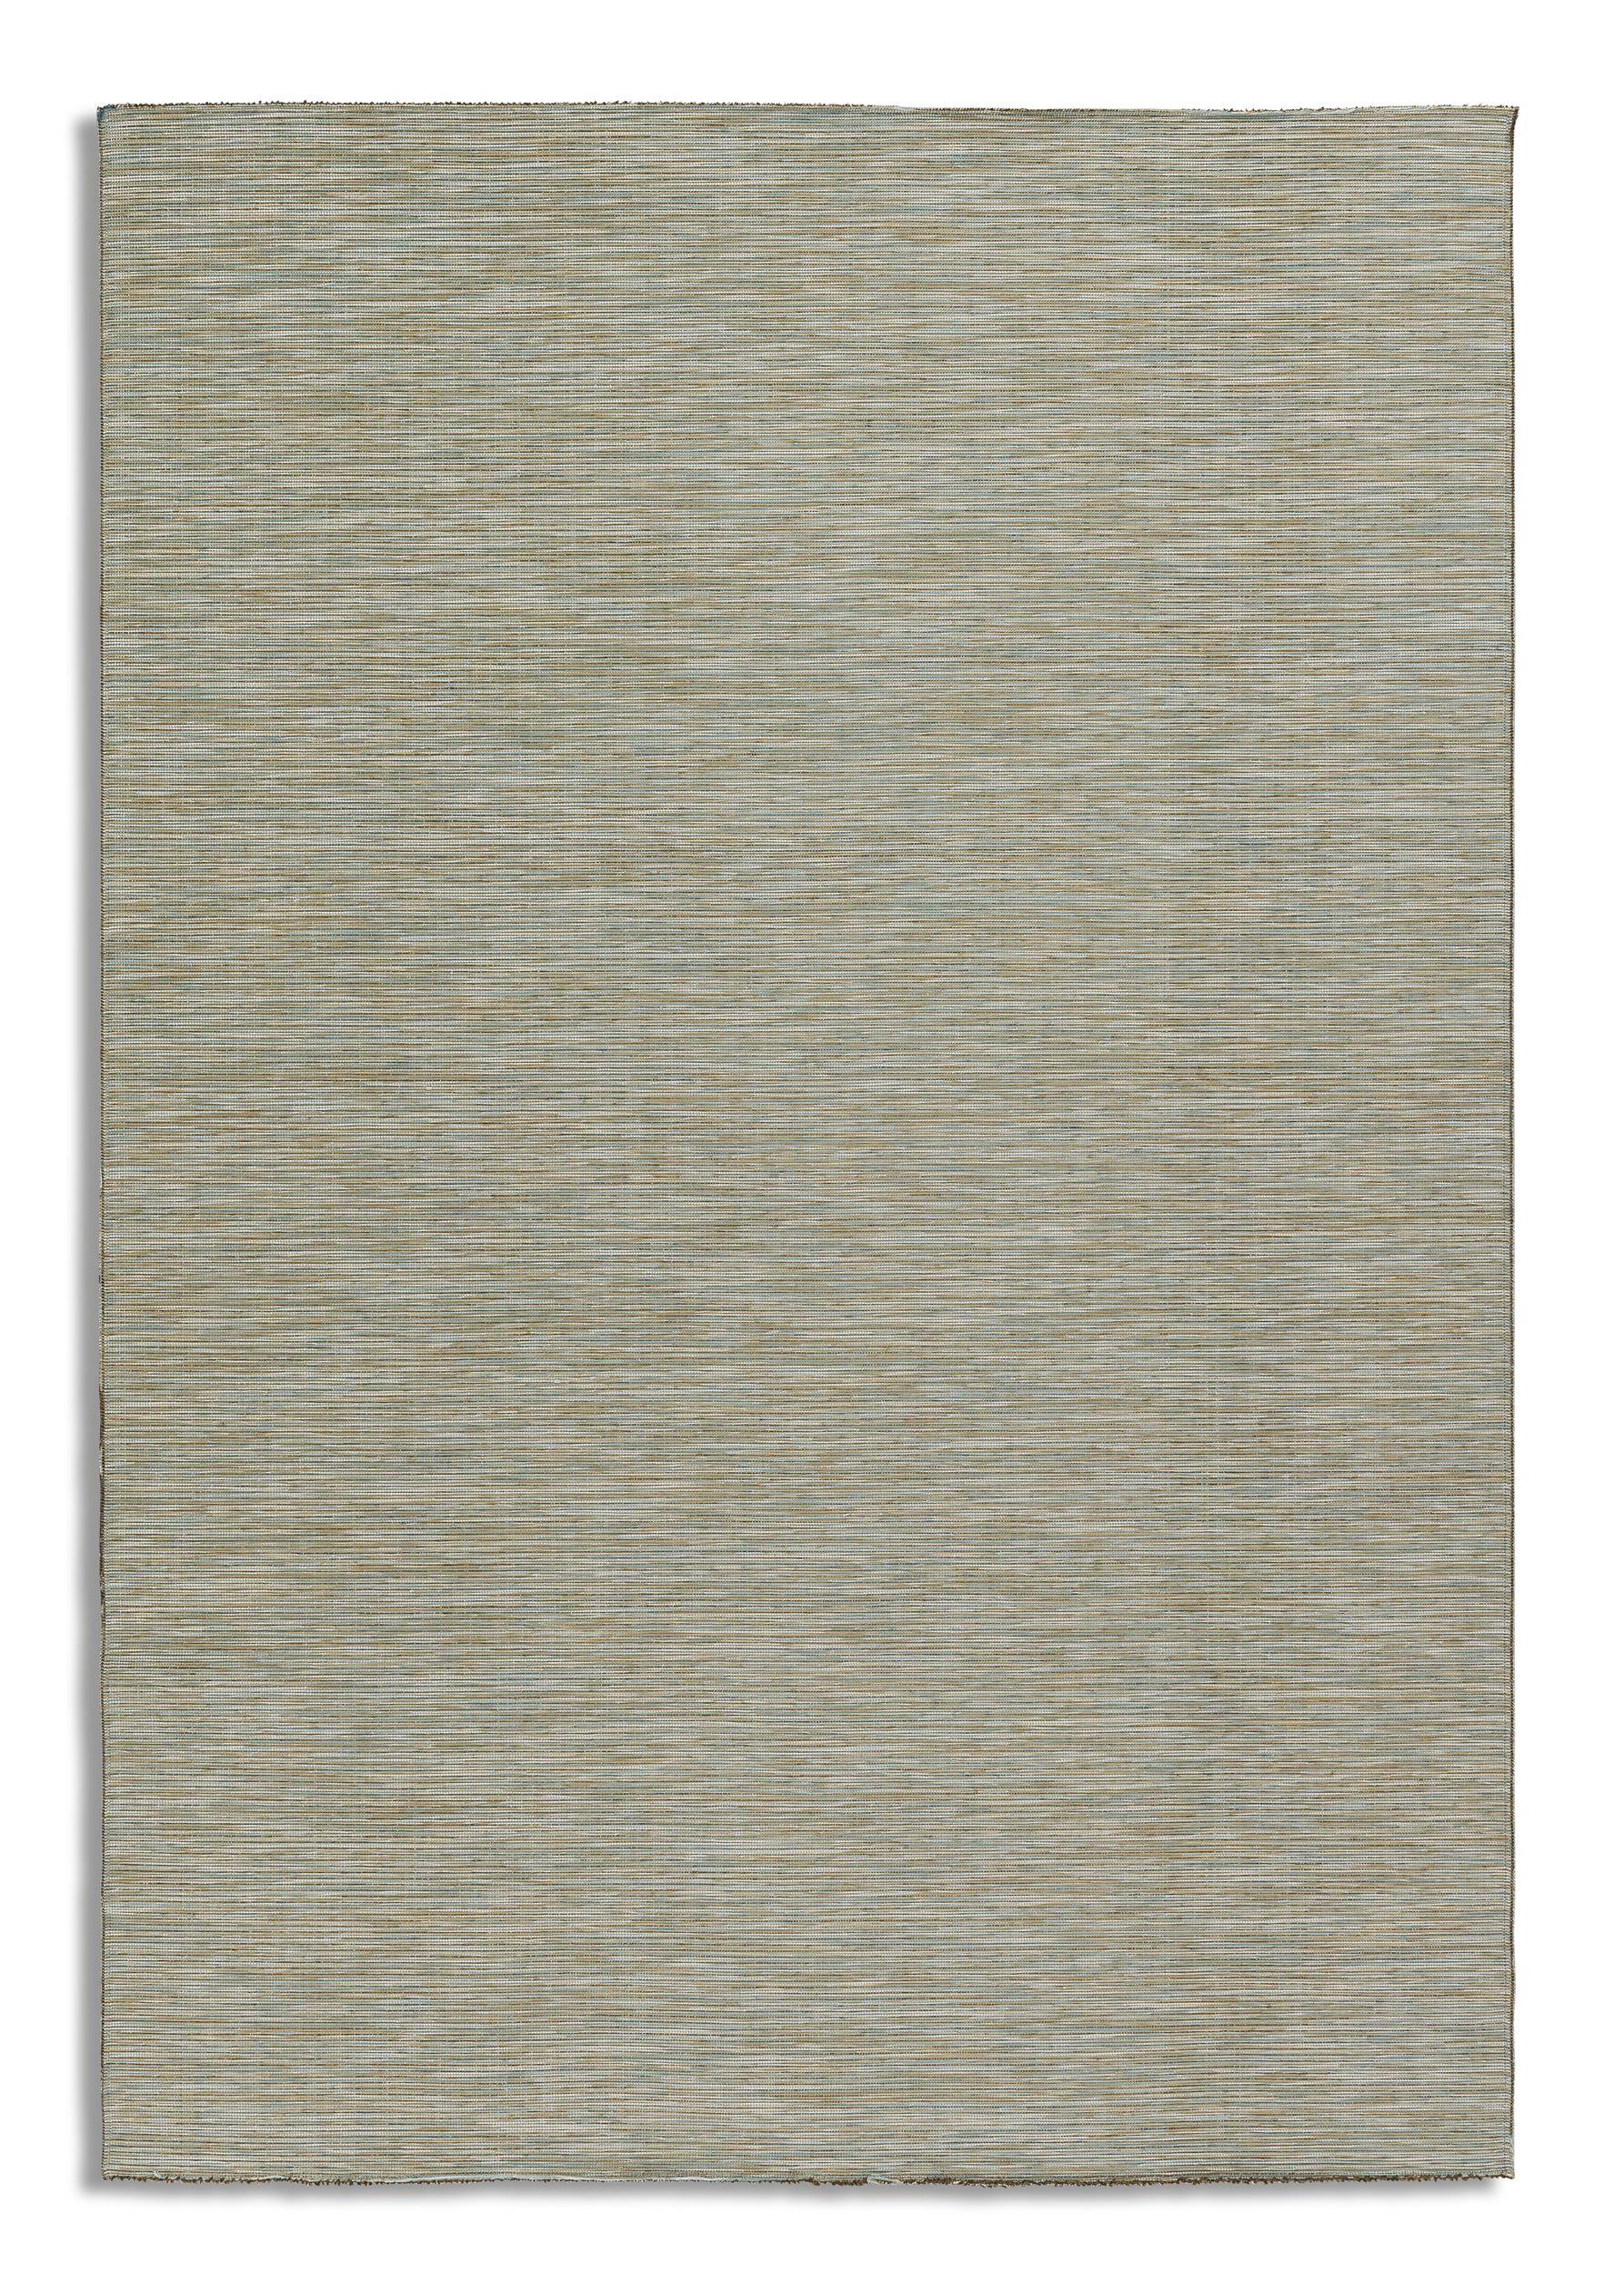 Teppich 133x190cm AMALFI